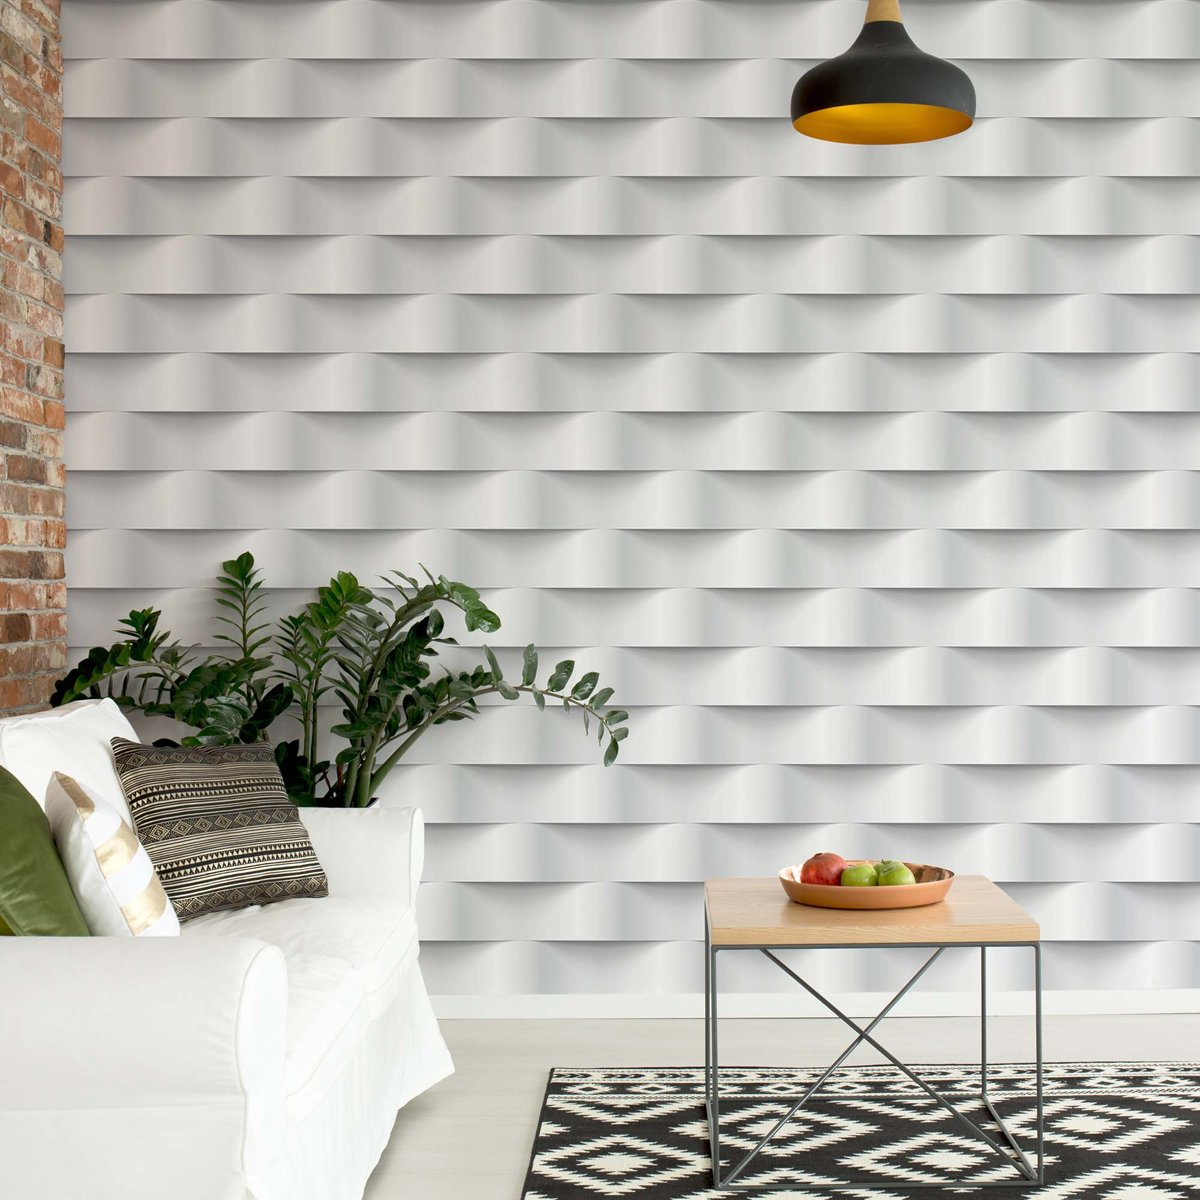 Fotobehang 3D Grey And White Pattern   V4 - 254cm x 184cm   130gr/m2 Vlies kopen